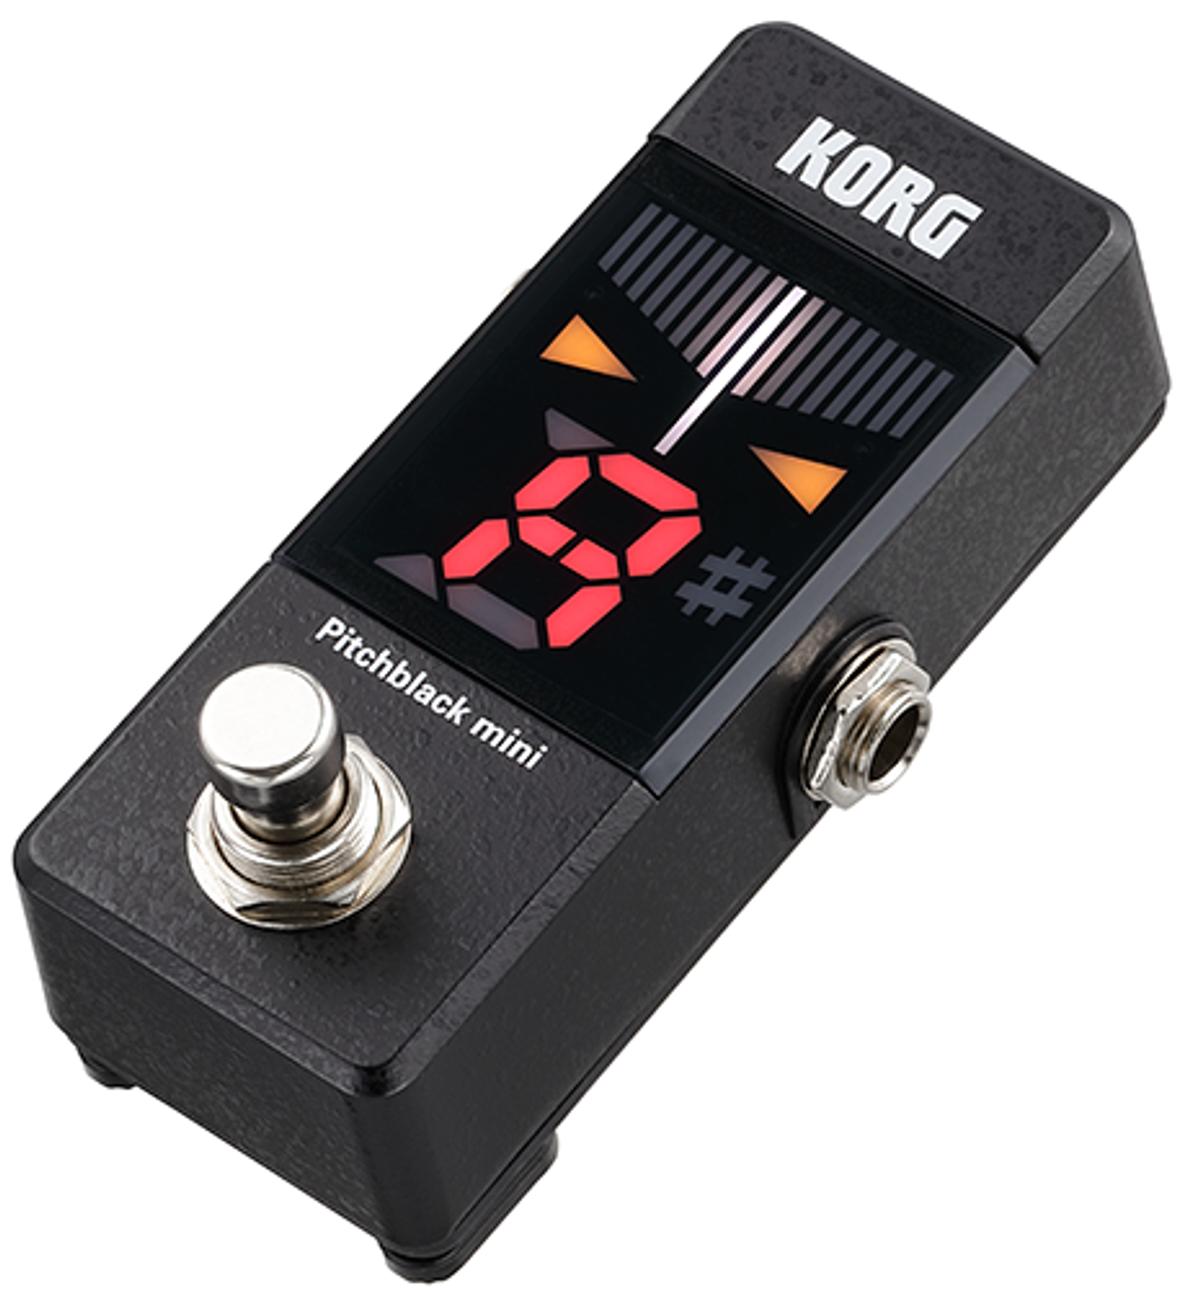 Korg Releases the Pitchblack Mini Tuner